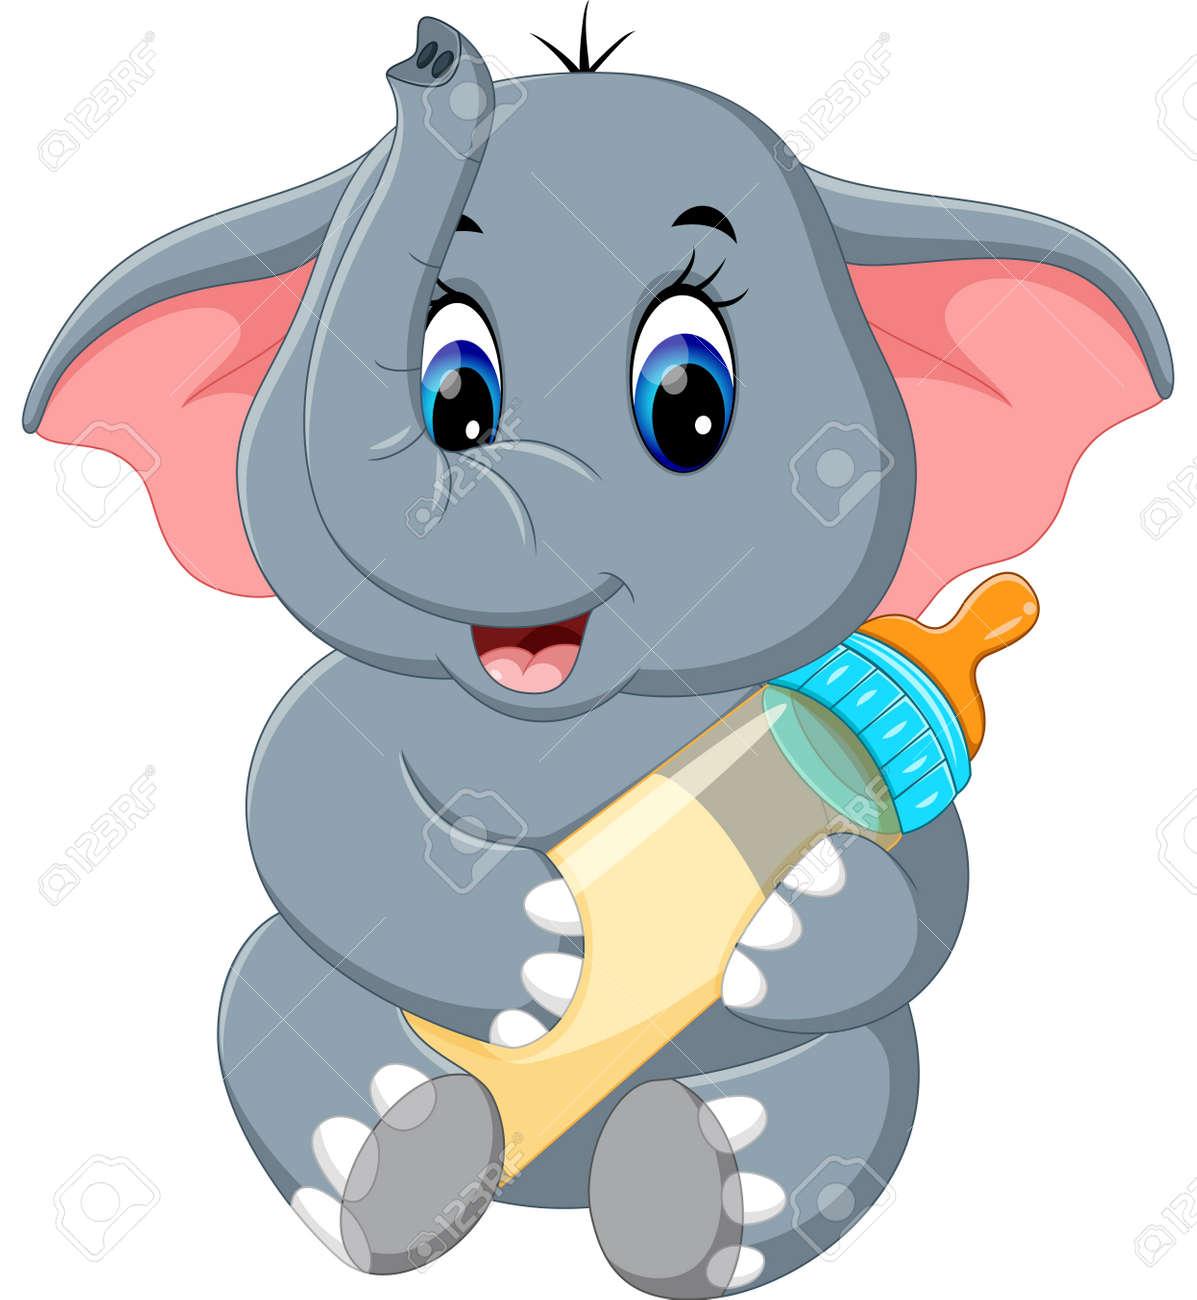 Cute elephant cartoon - 60915211